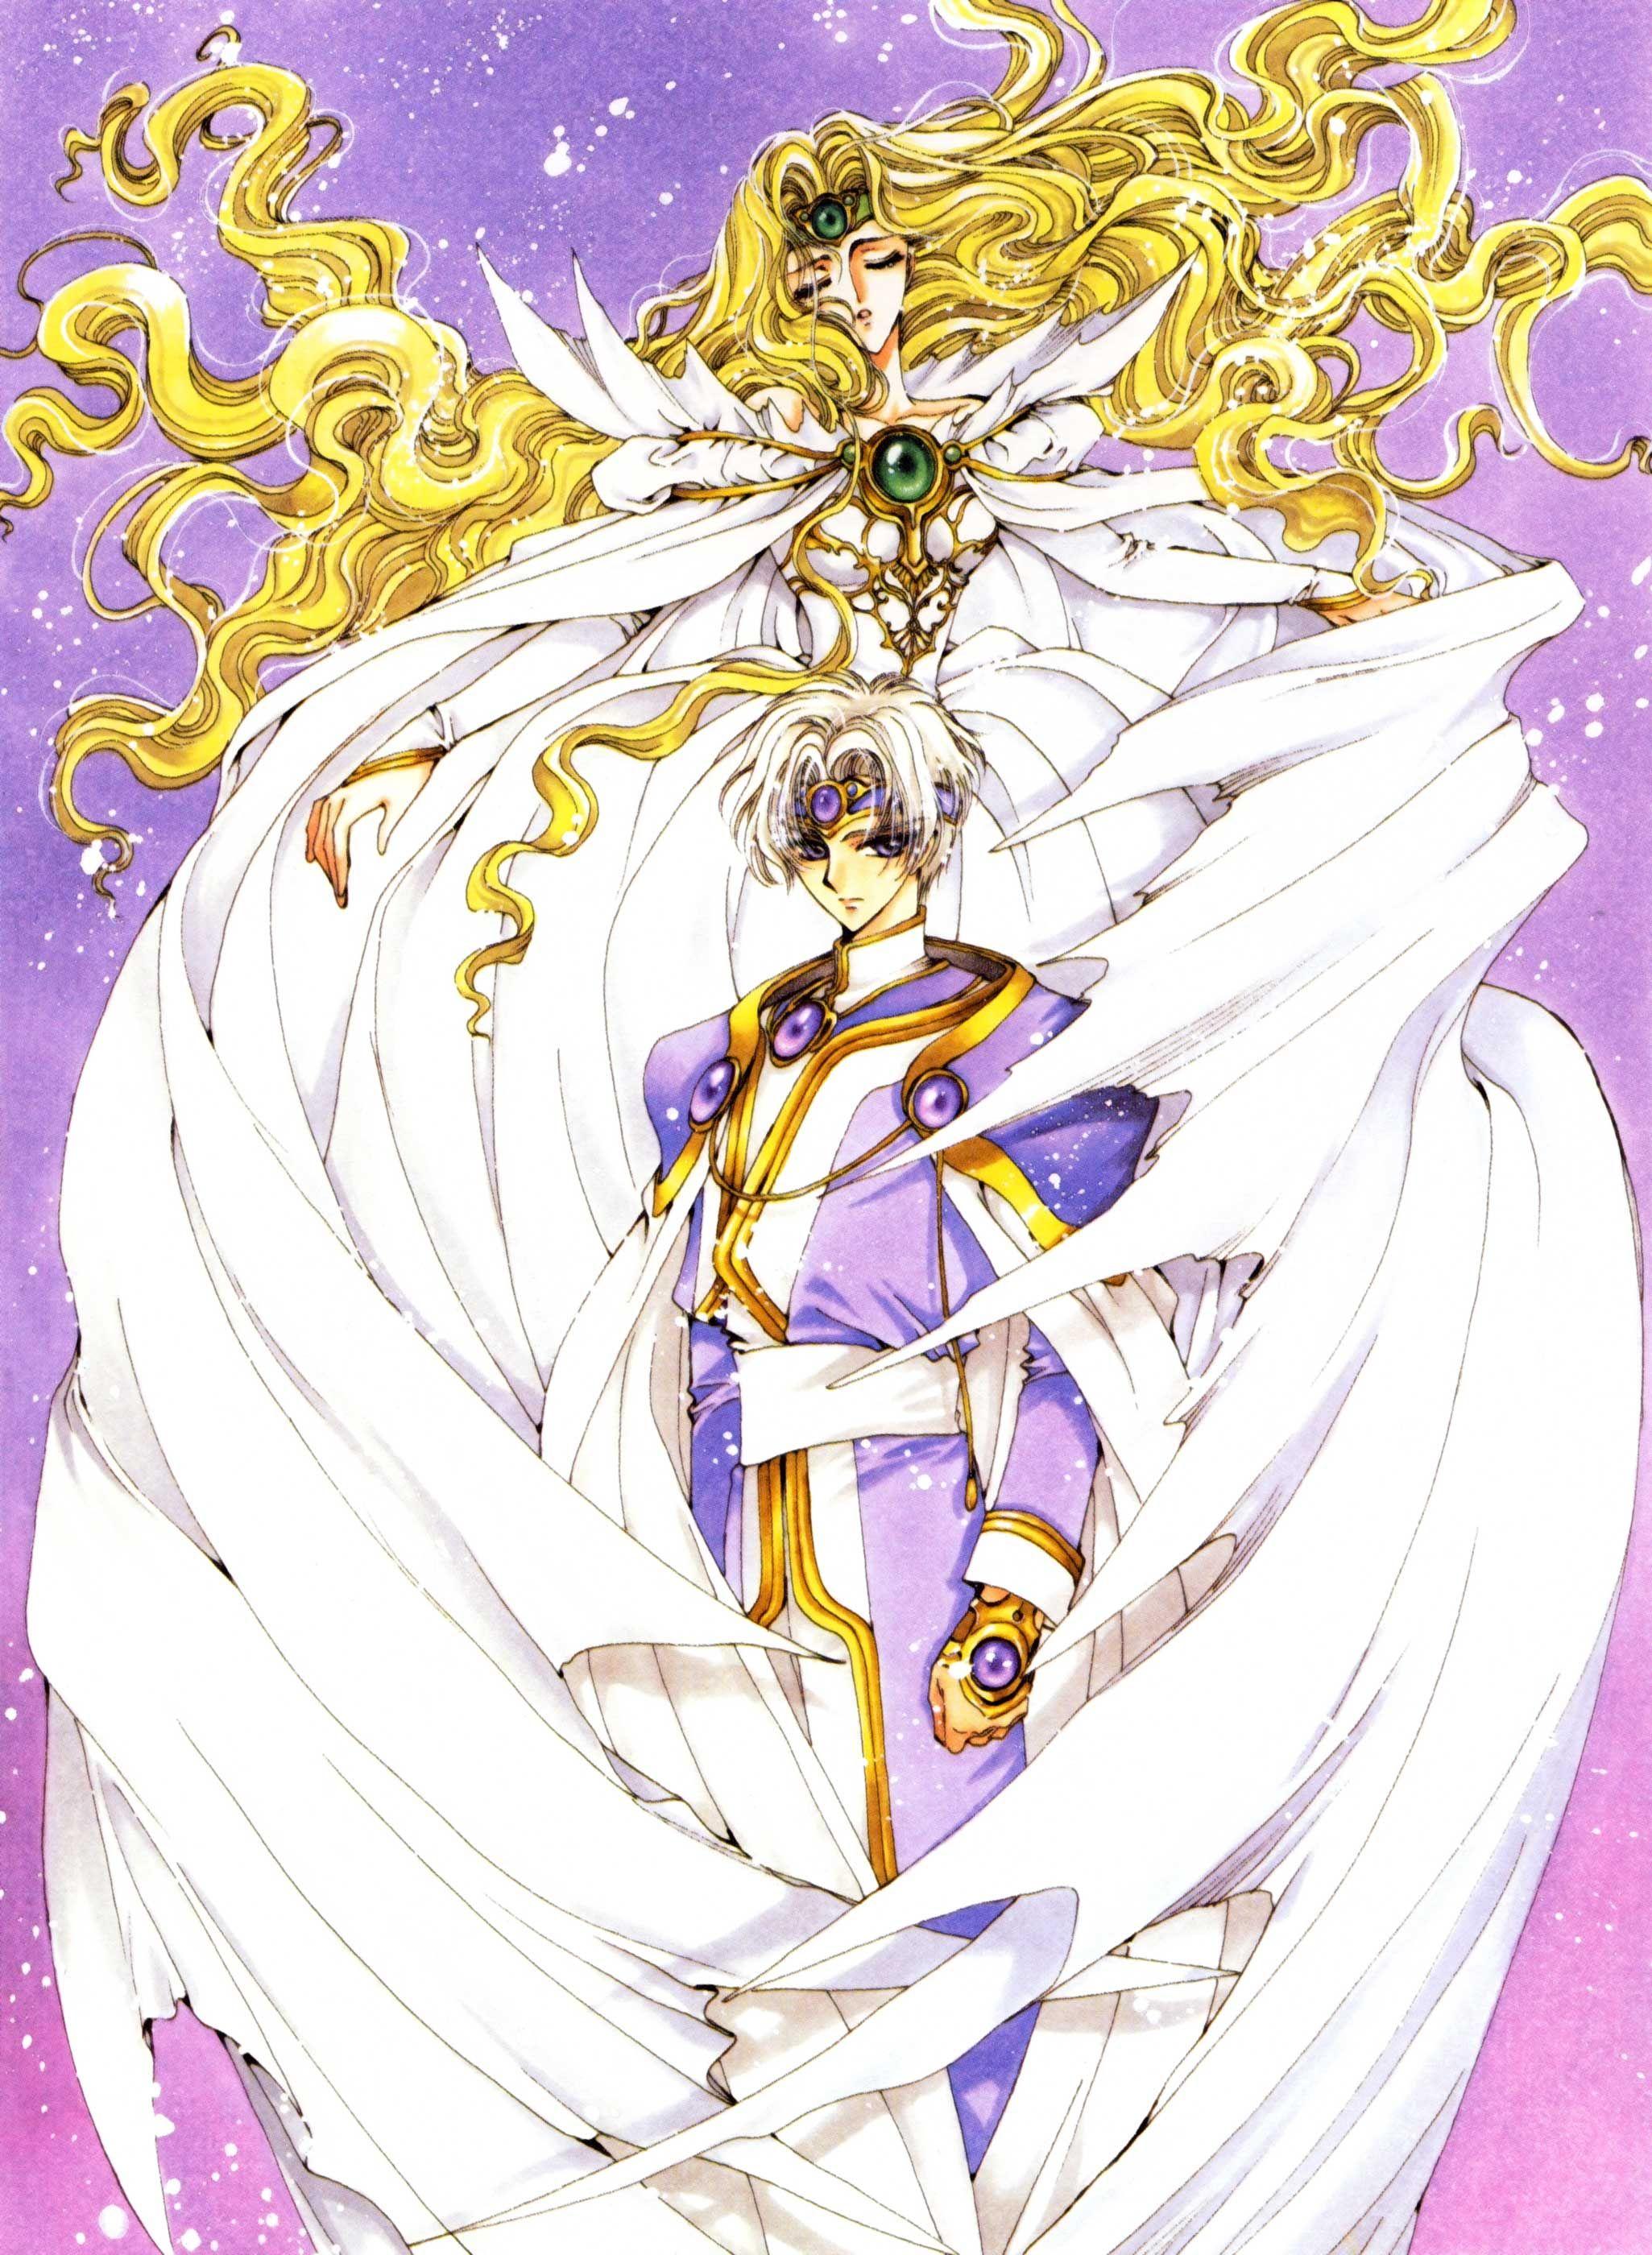 Magic Knight Rayearth by CLAMP CLAMP Manga Pinterest